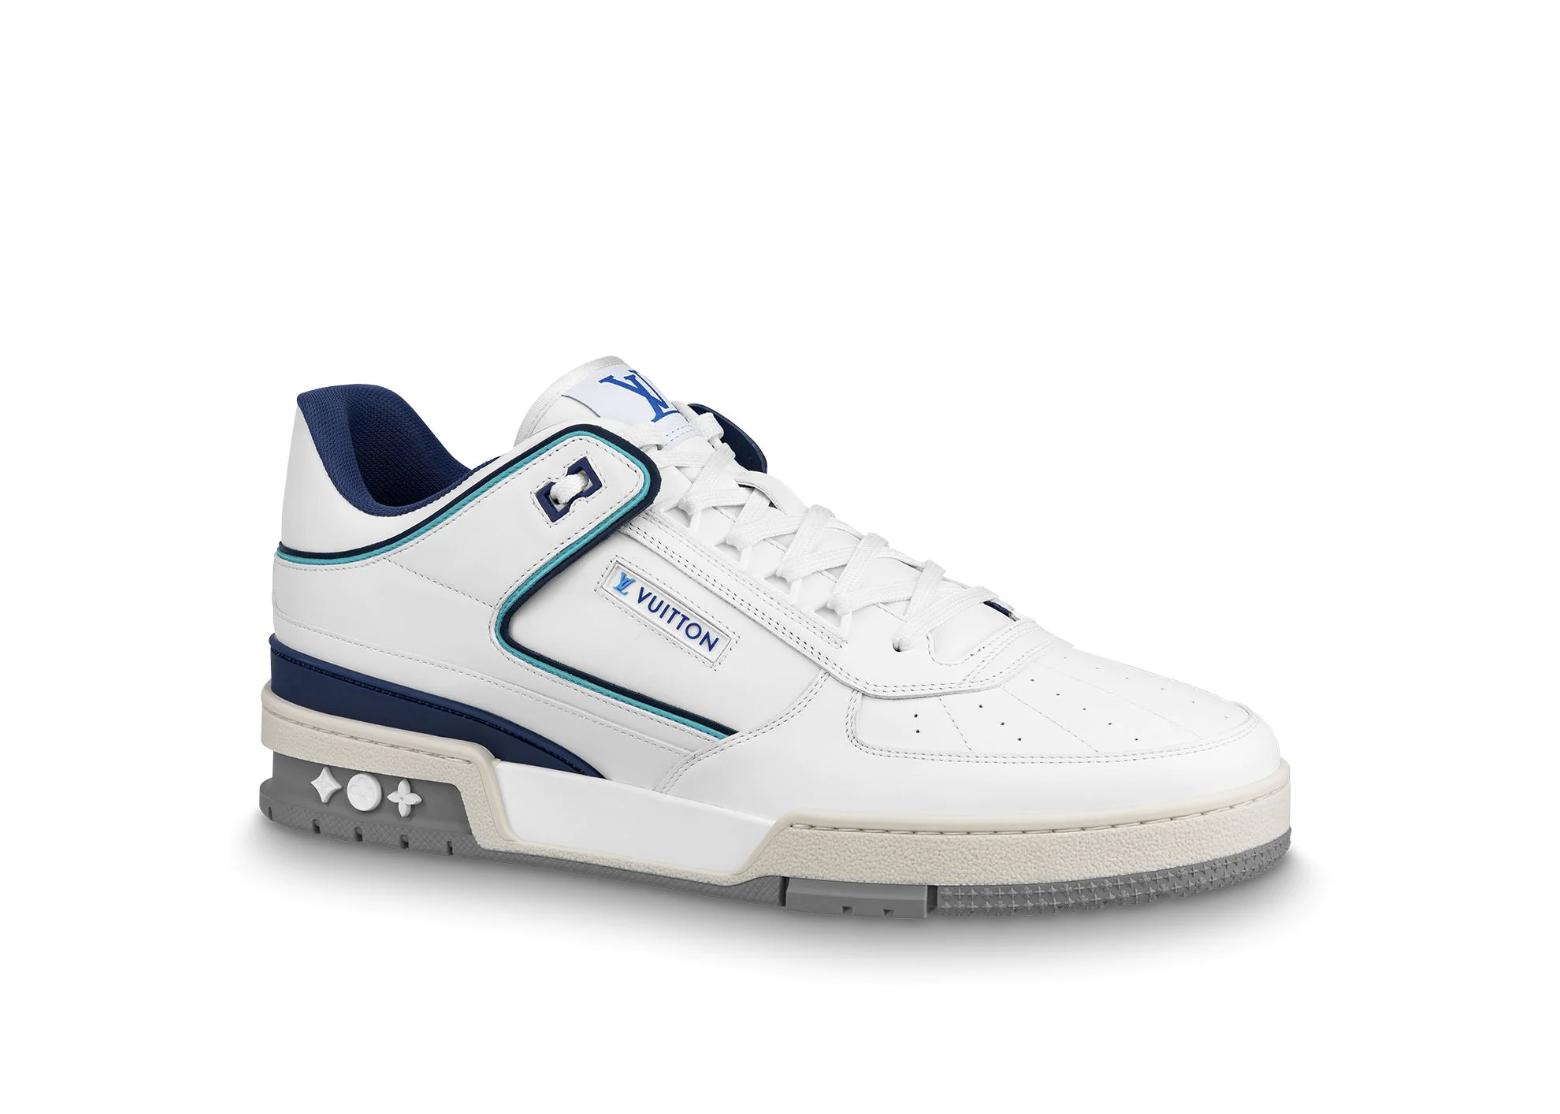 Louis Vuitton Trainer Sneaker White